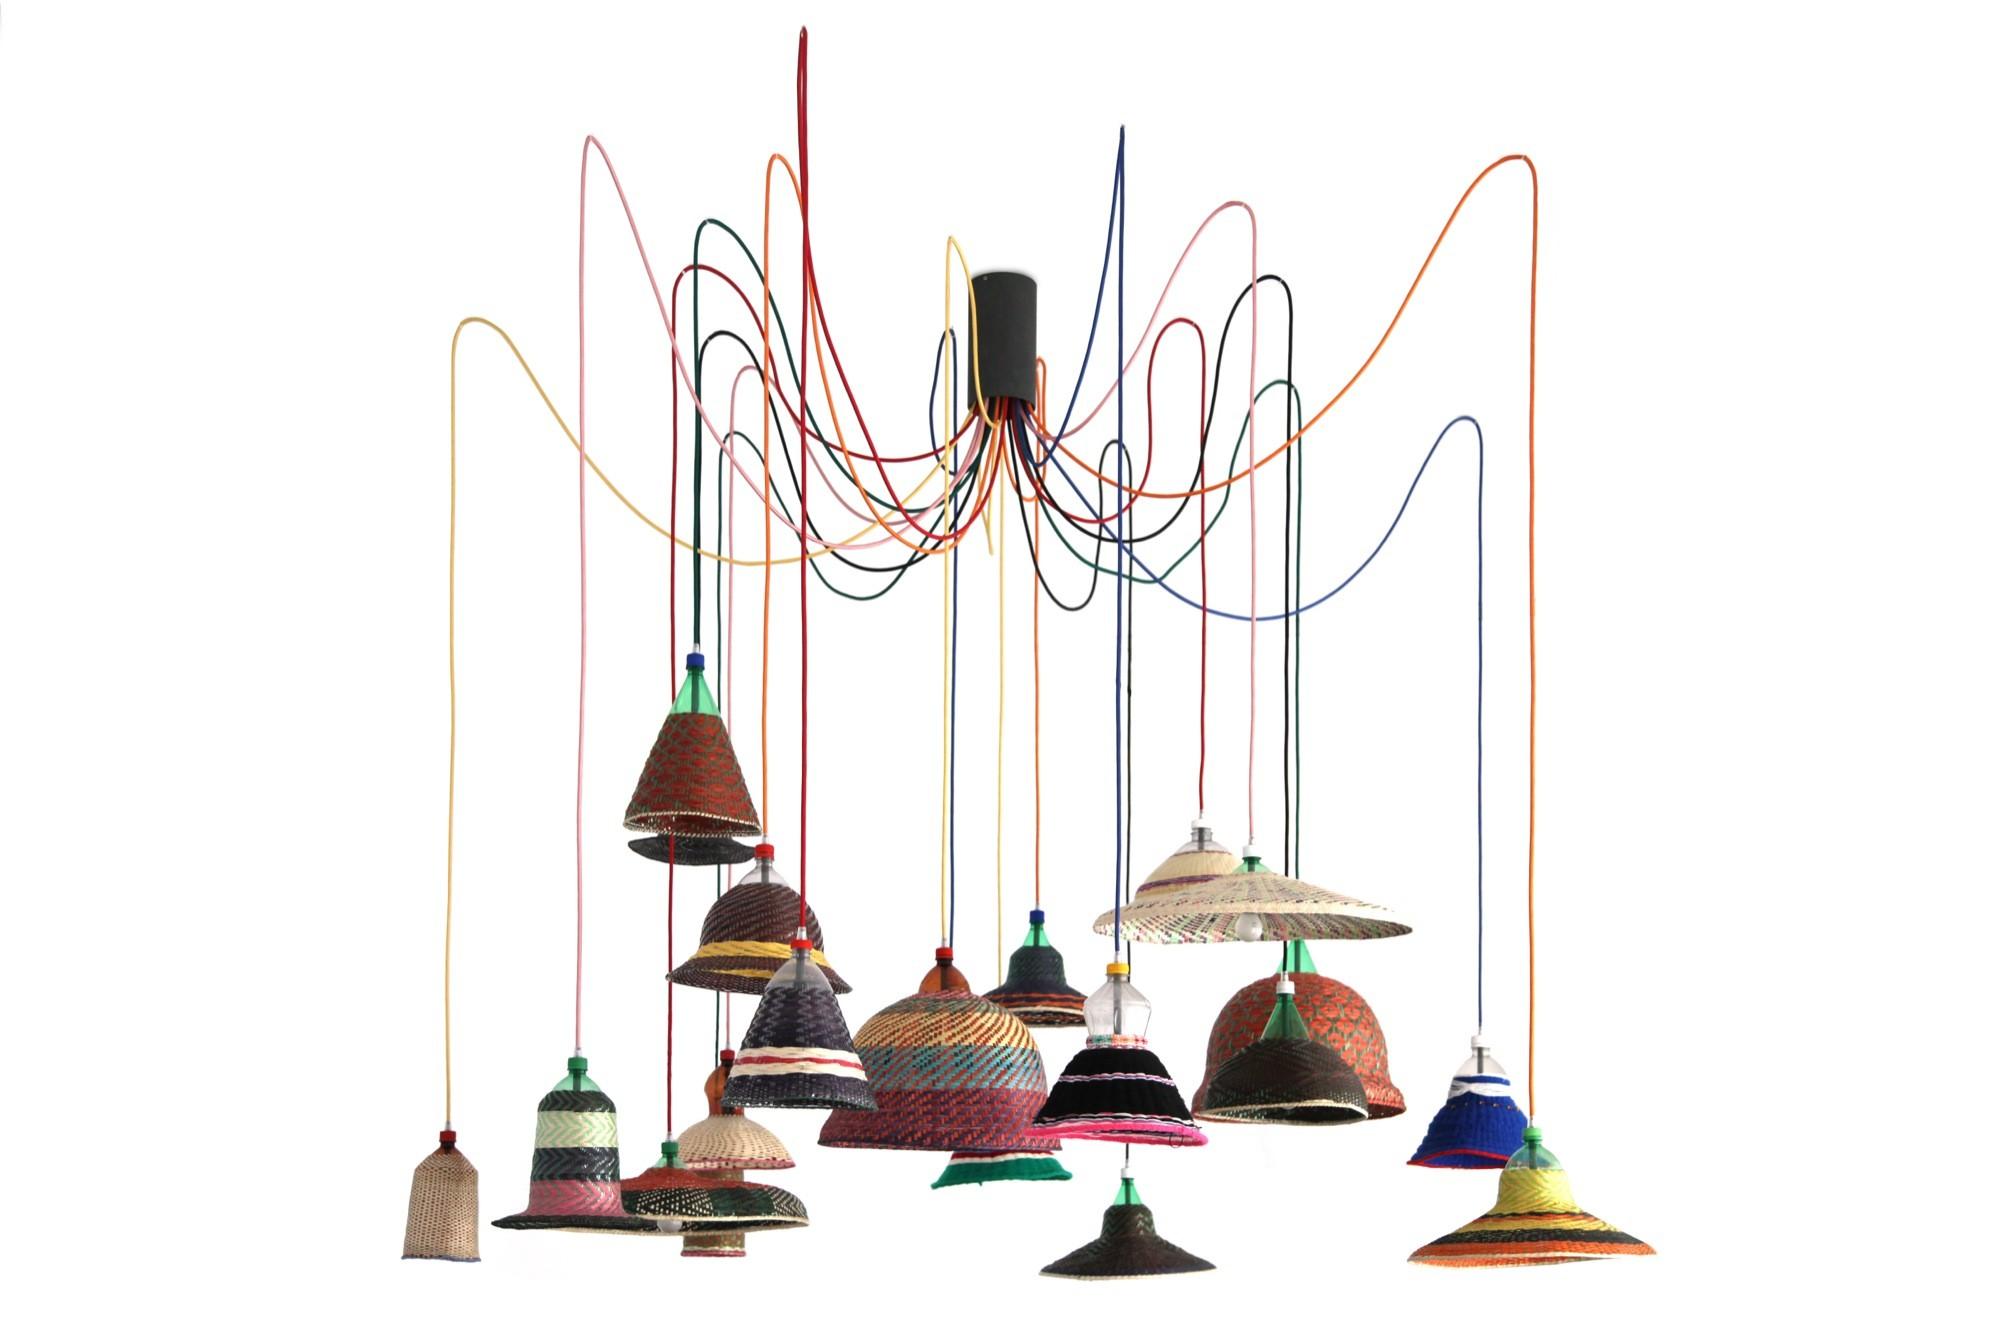 PET Lamp / Álvaro Catalán de Ocón, Courtesy of Álvaro Catalán de Ocón